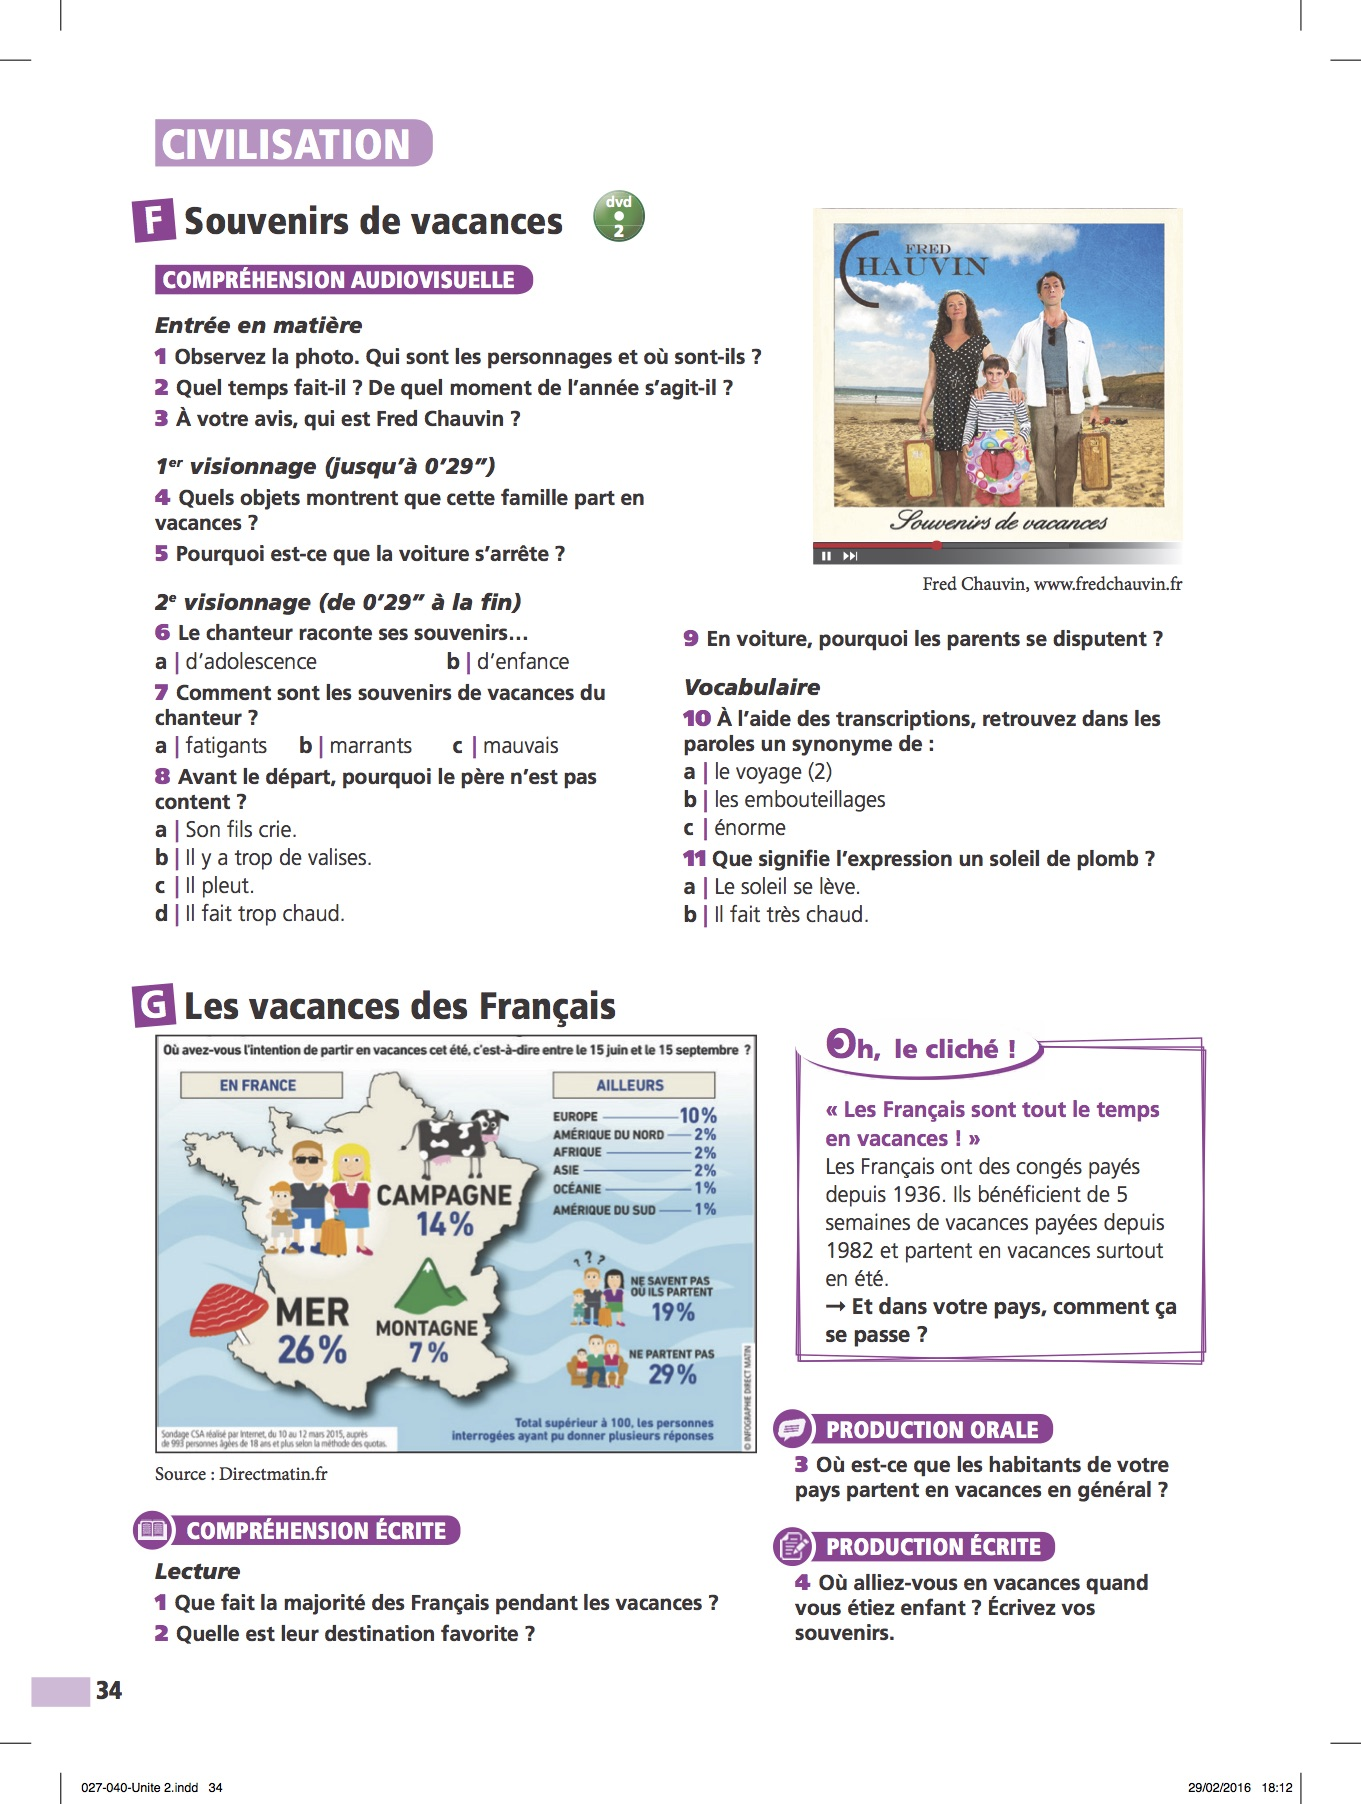 Fred Chauvin Edito A2 Francais Langue Etrangere